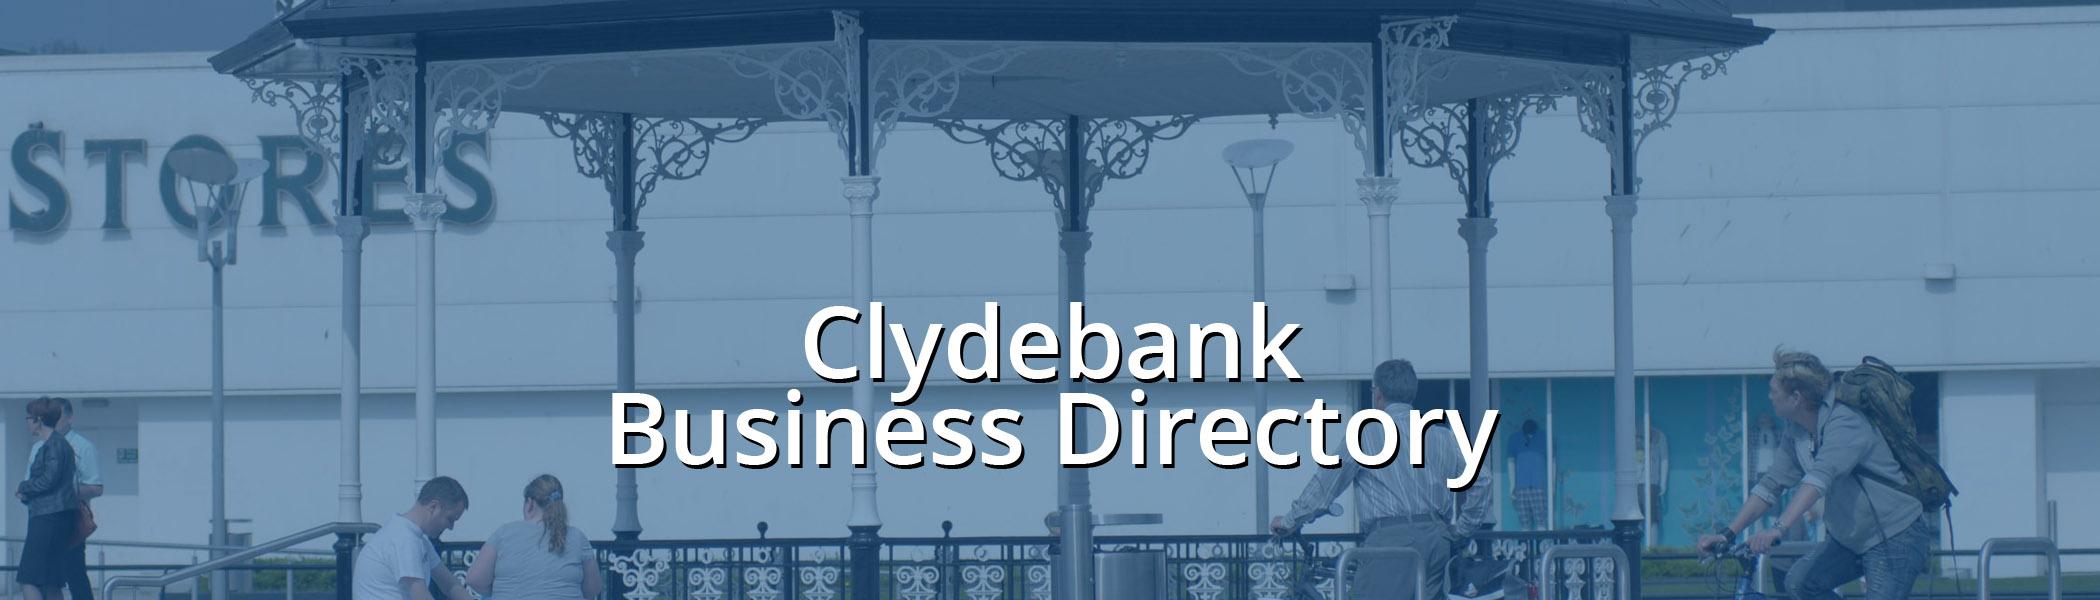 Clydebank Loves Local